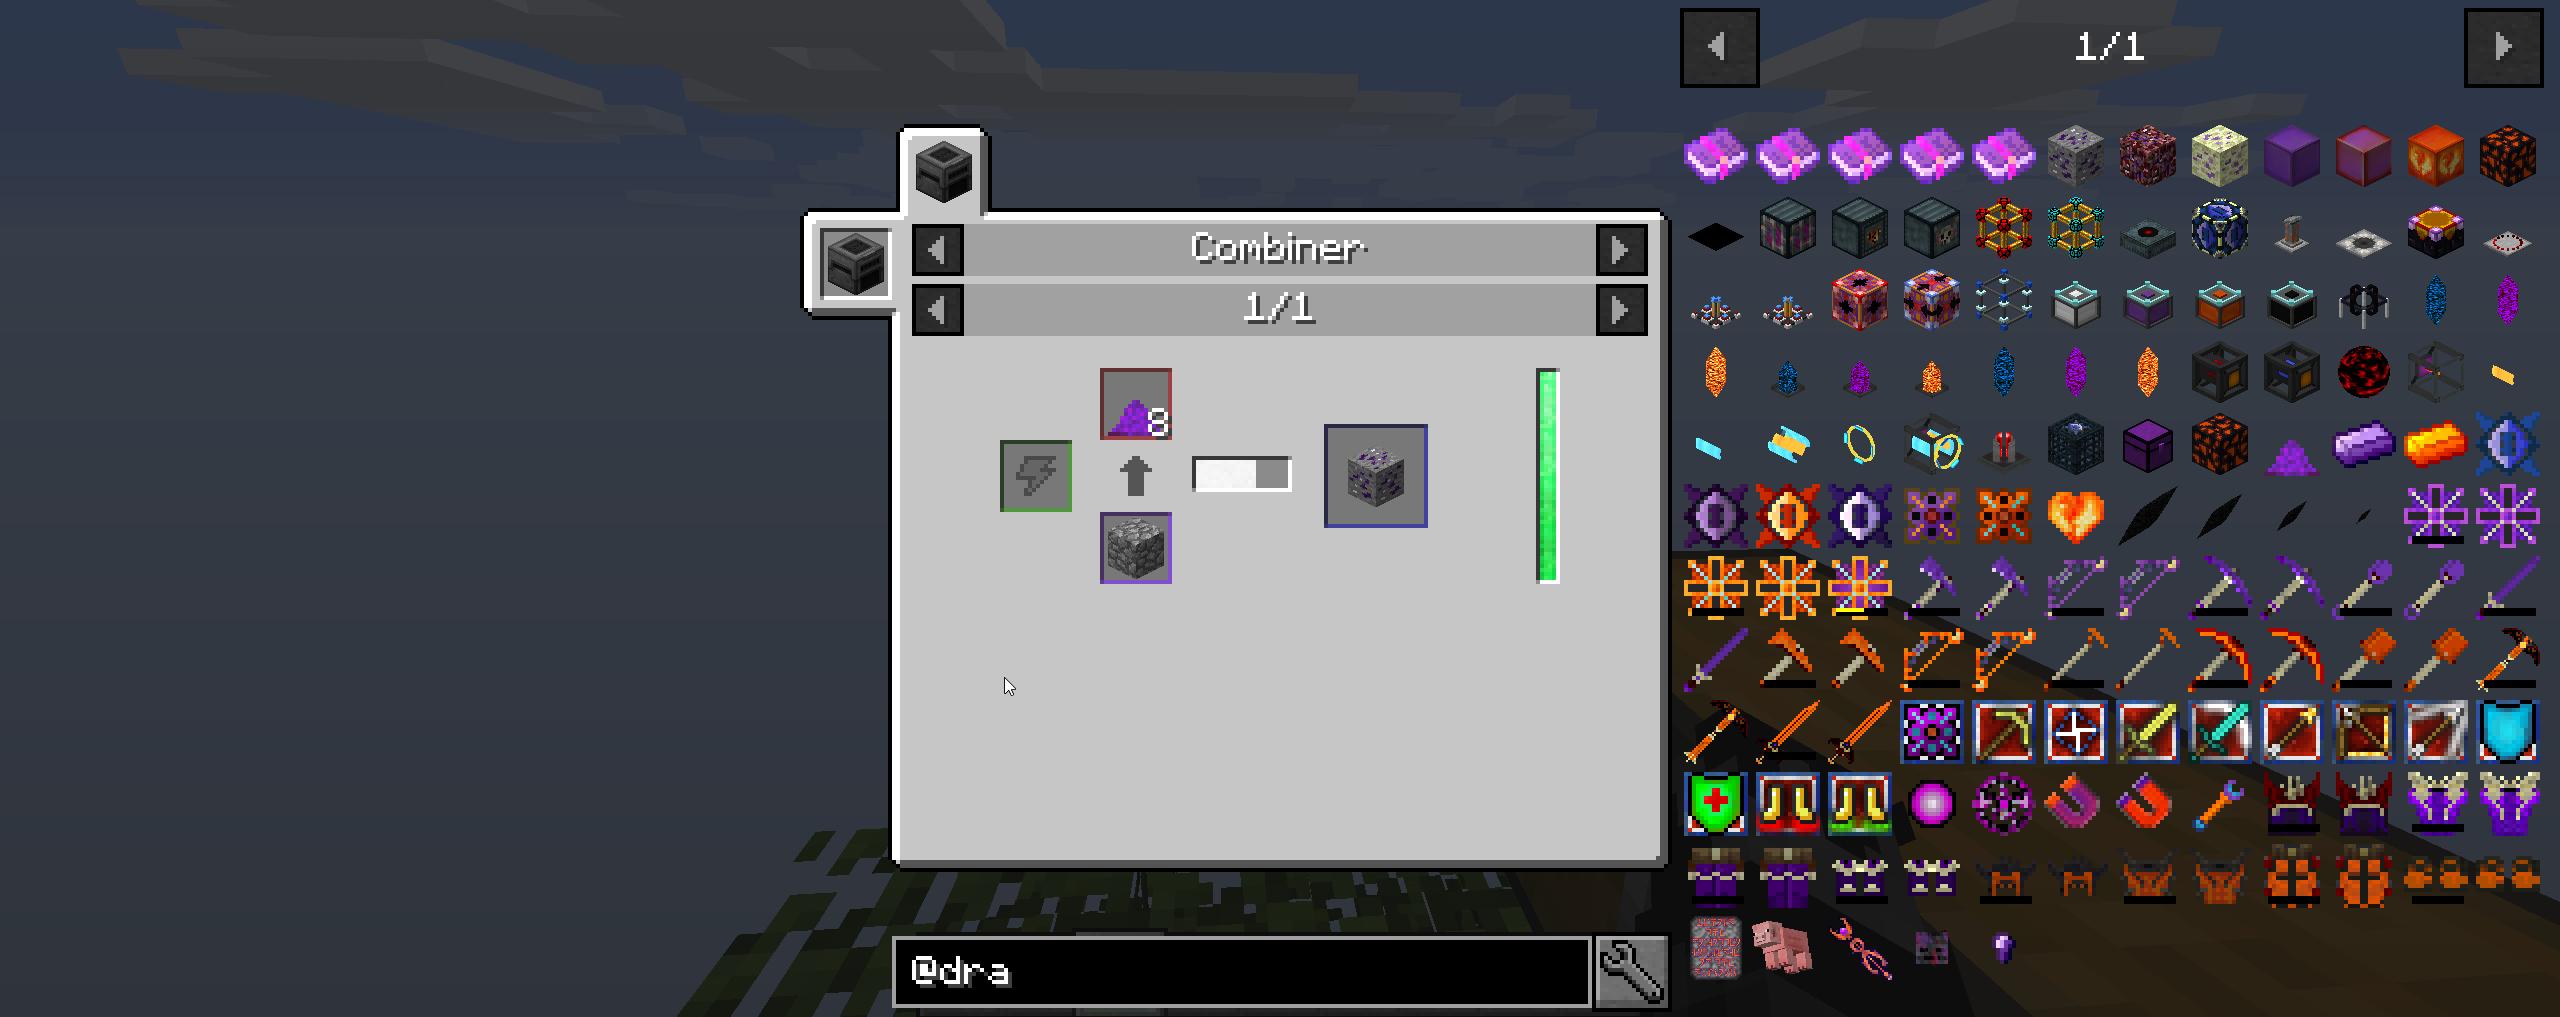 Crafttweker Combiner Remove does not work -